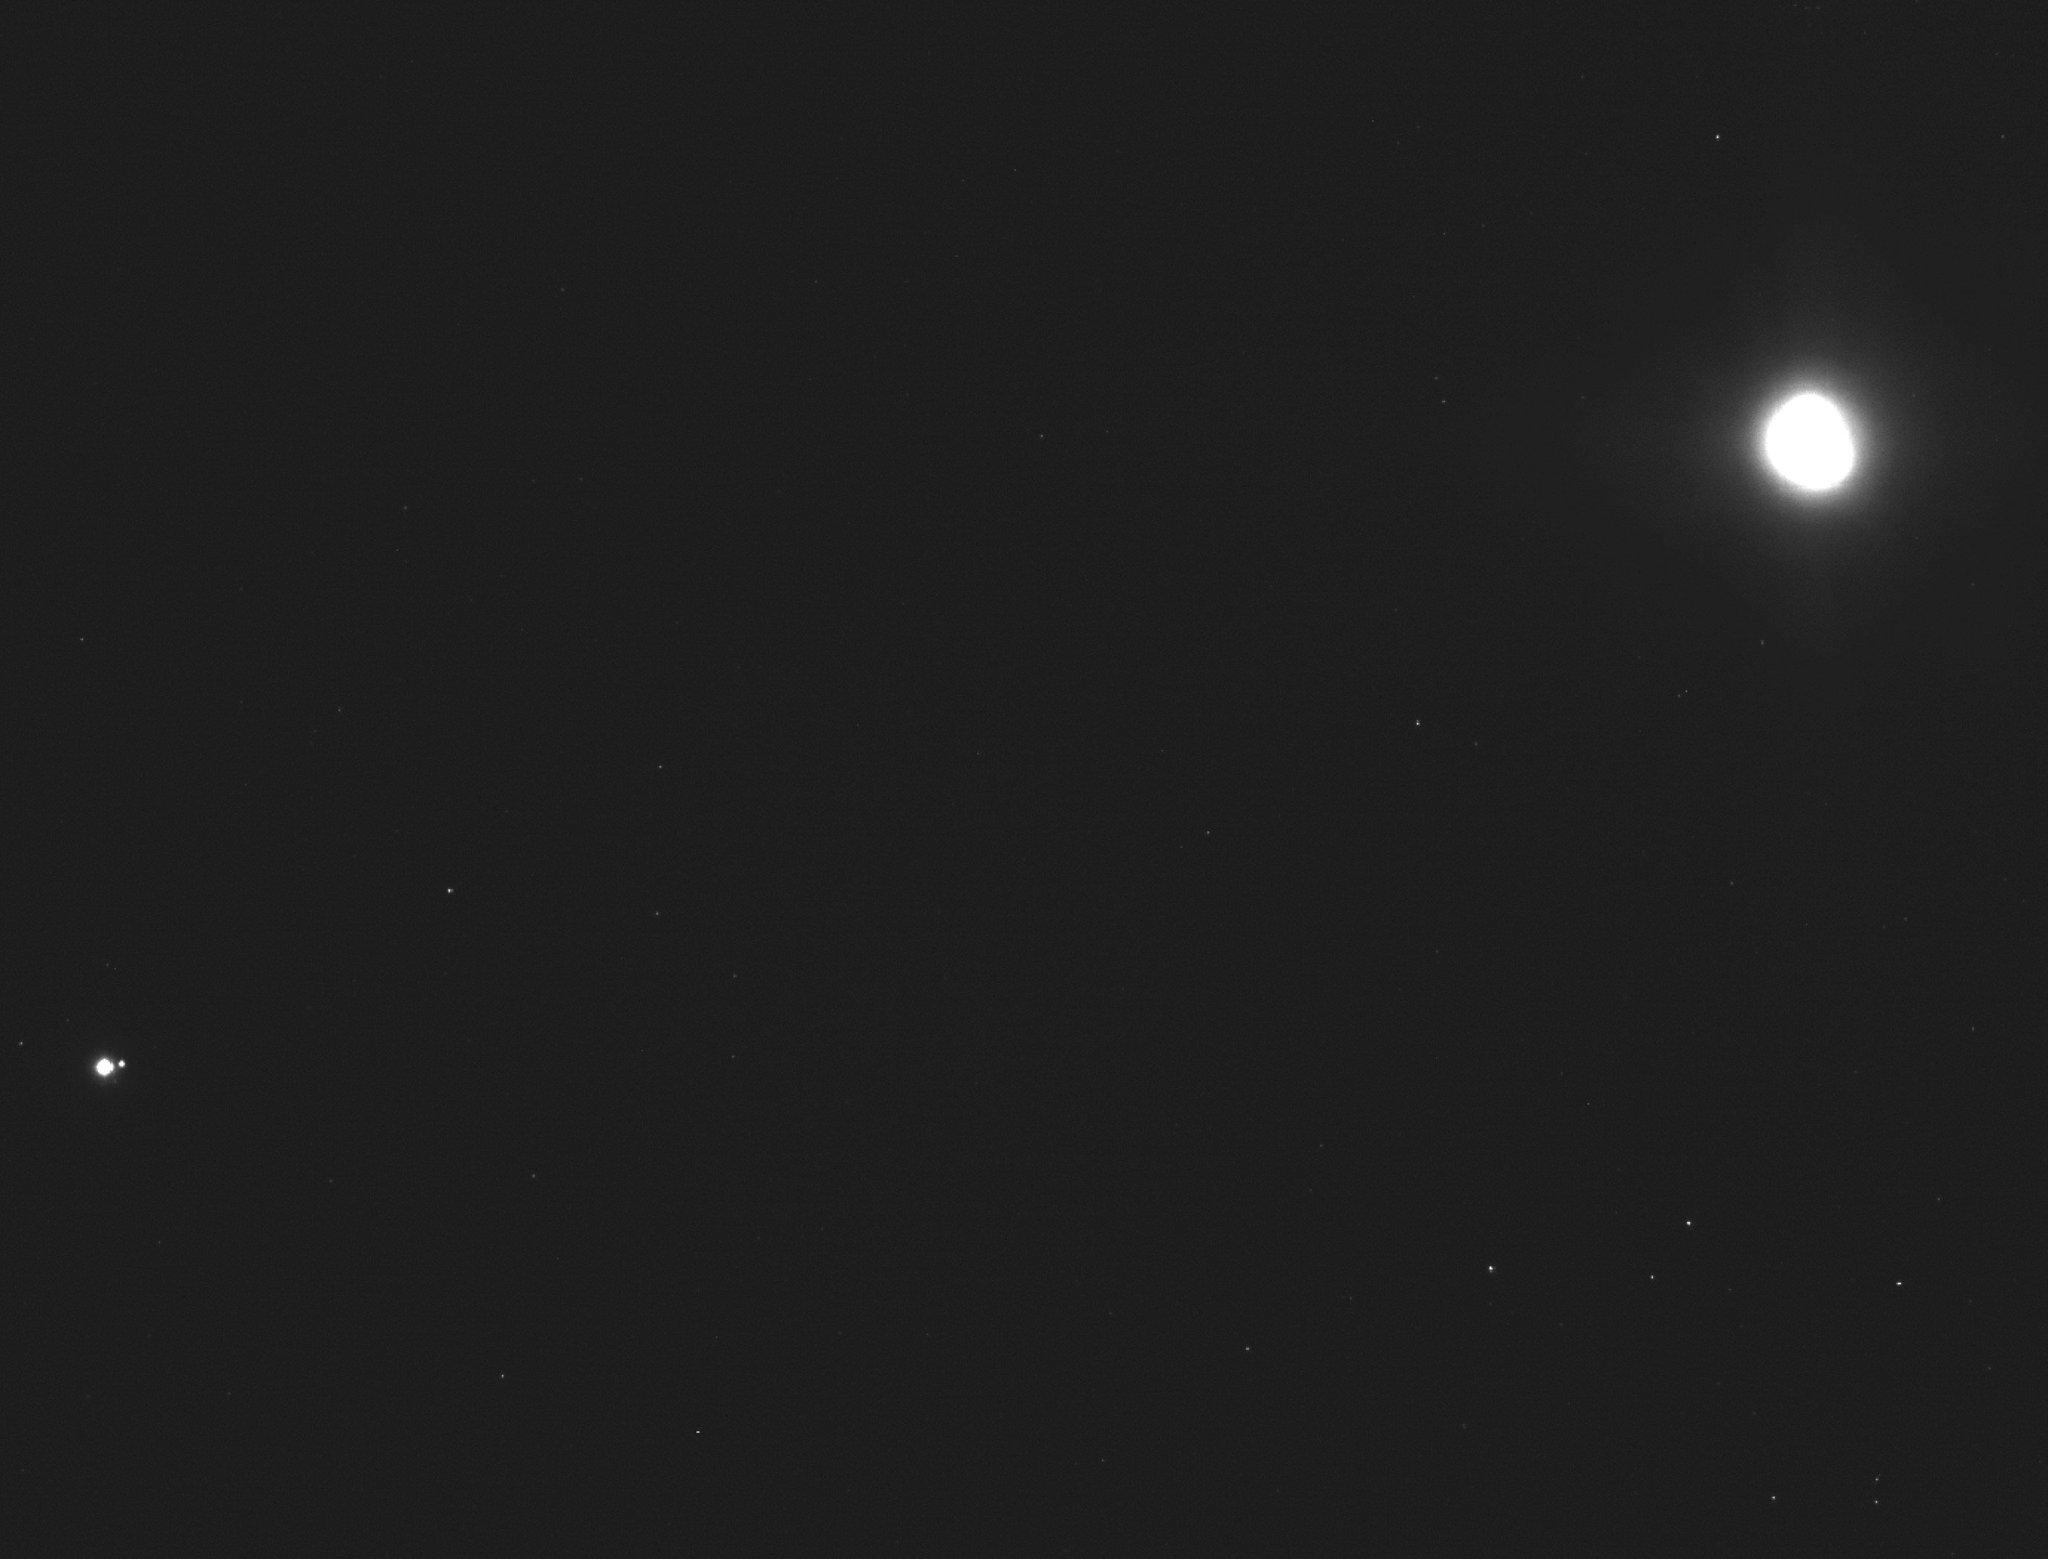 OSIRIS-REx - Mission autour de Bennu - Page 4 DwFJTU2U8AAJtfa